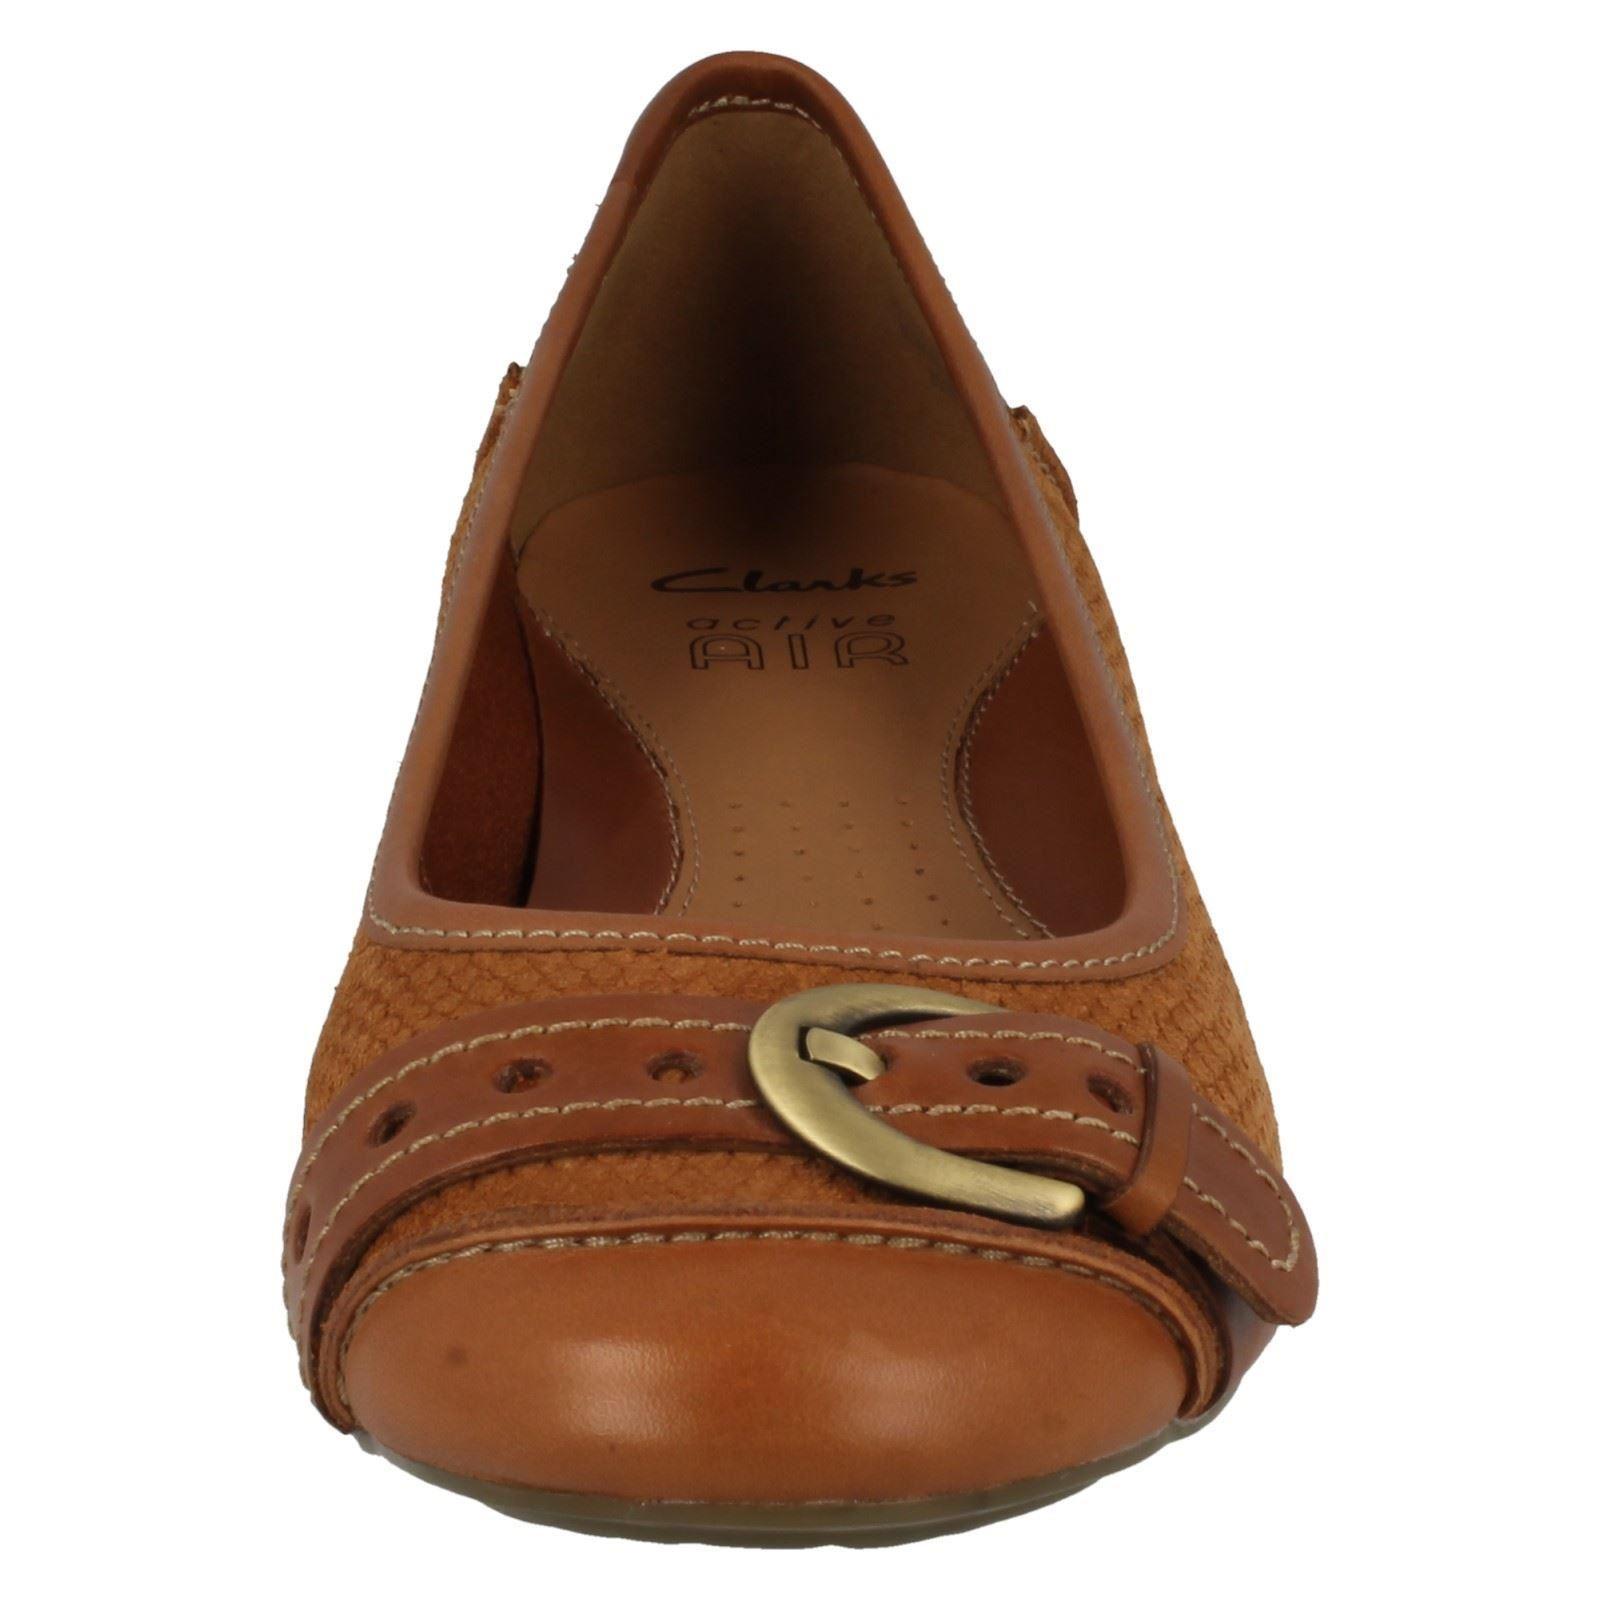 Clarks Henderson Jazz Shoes